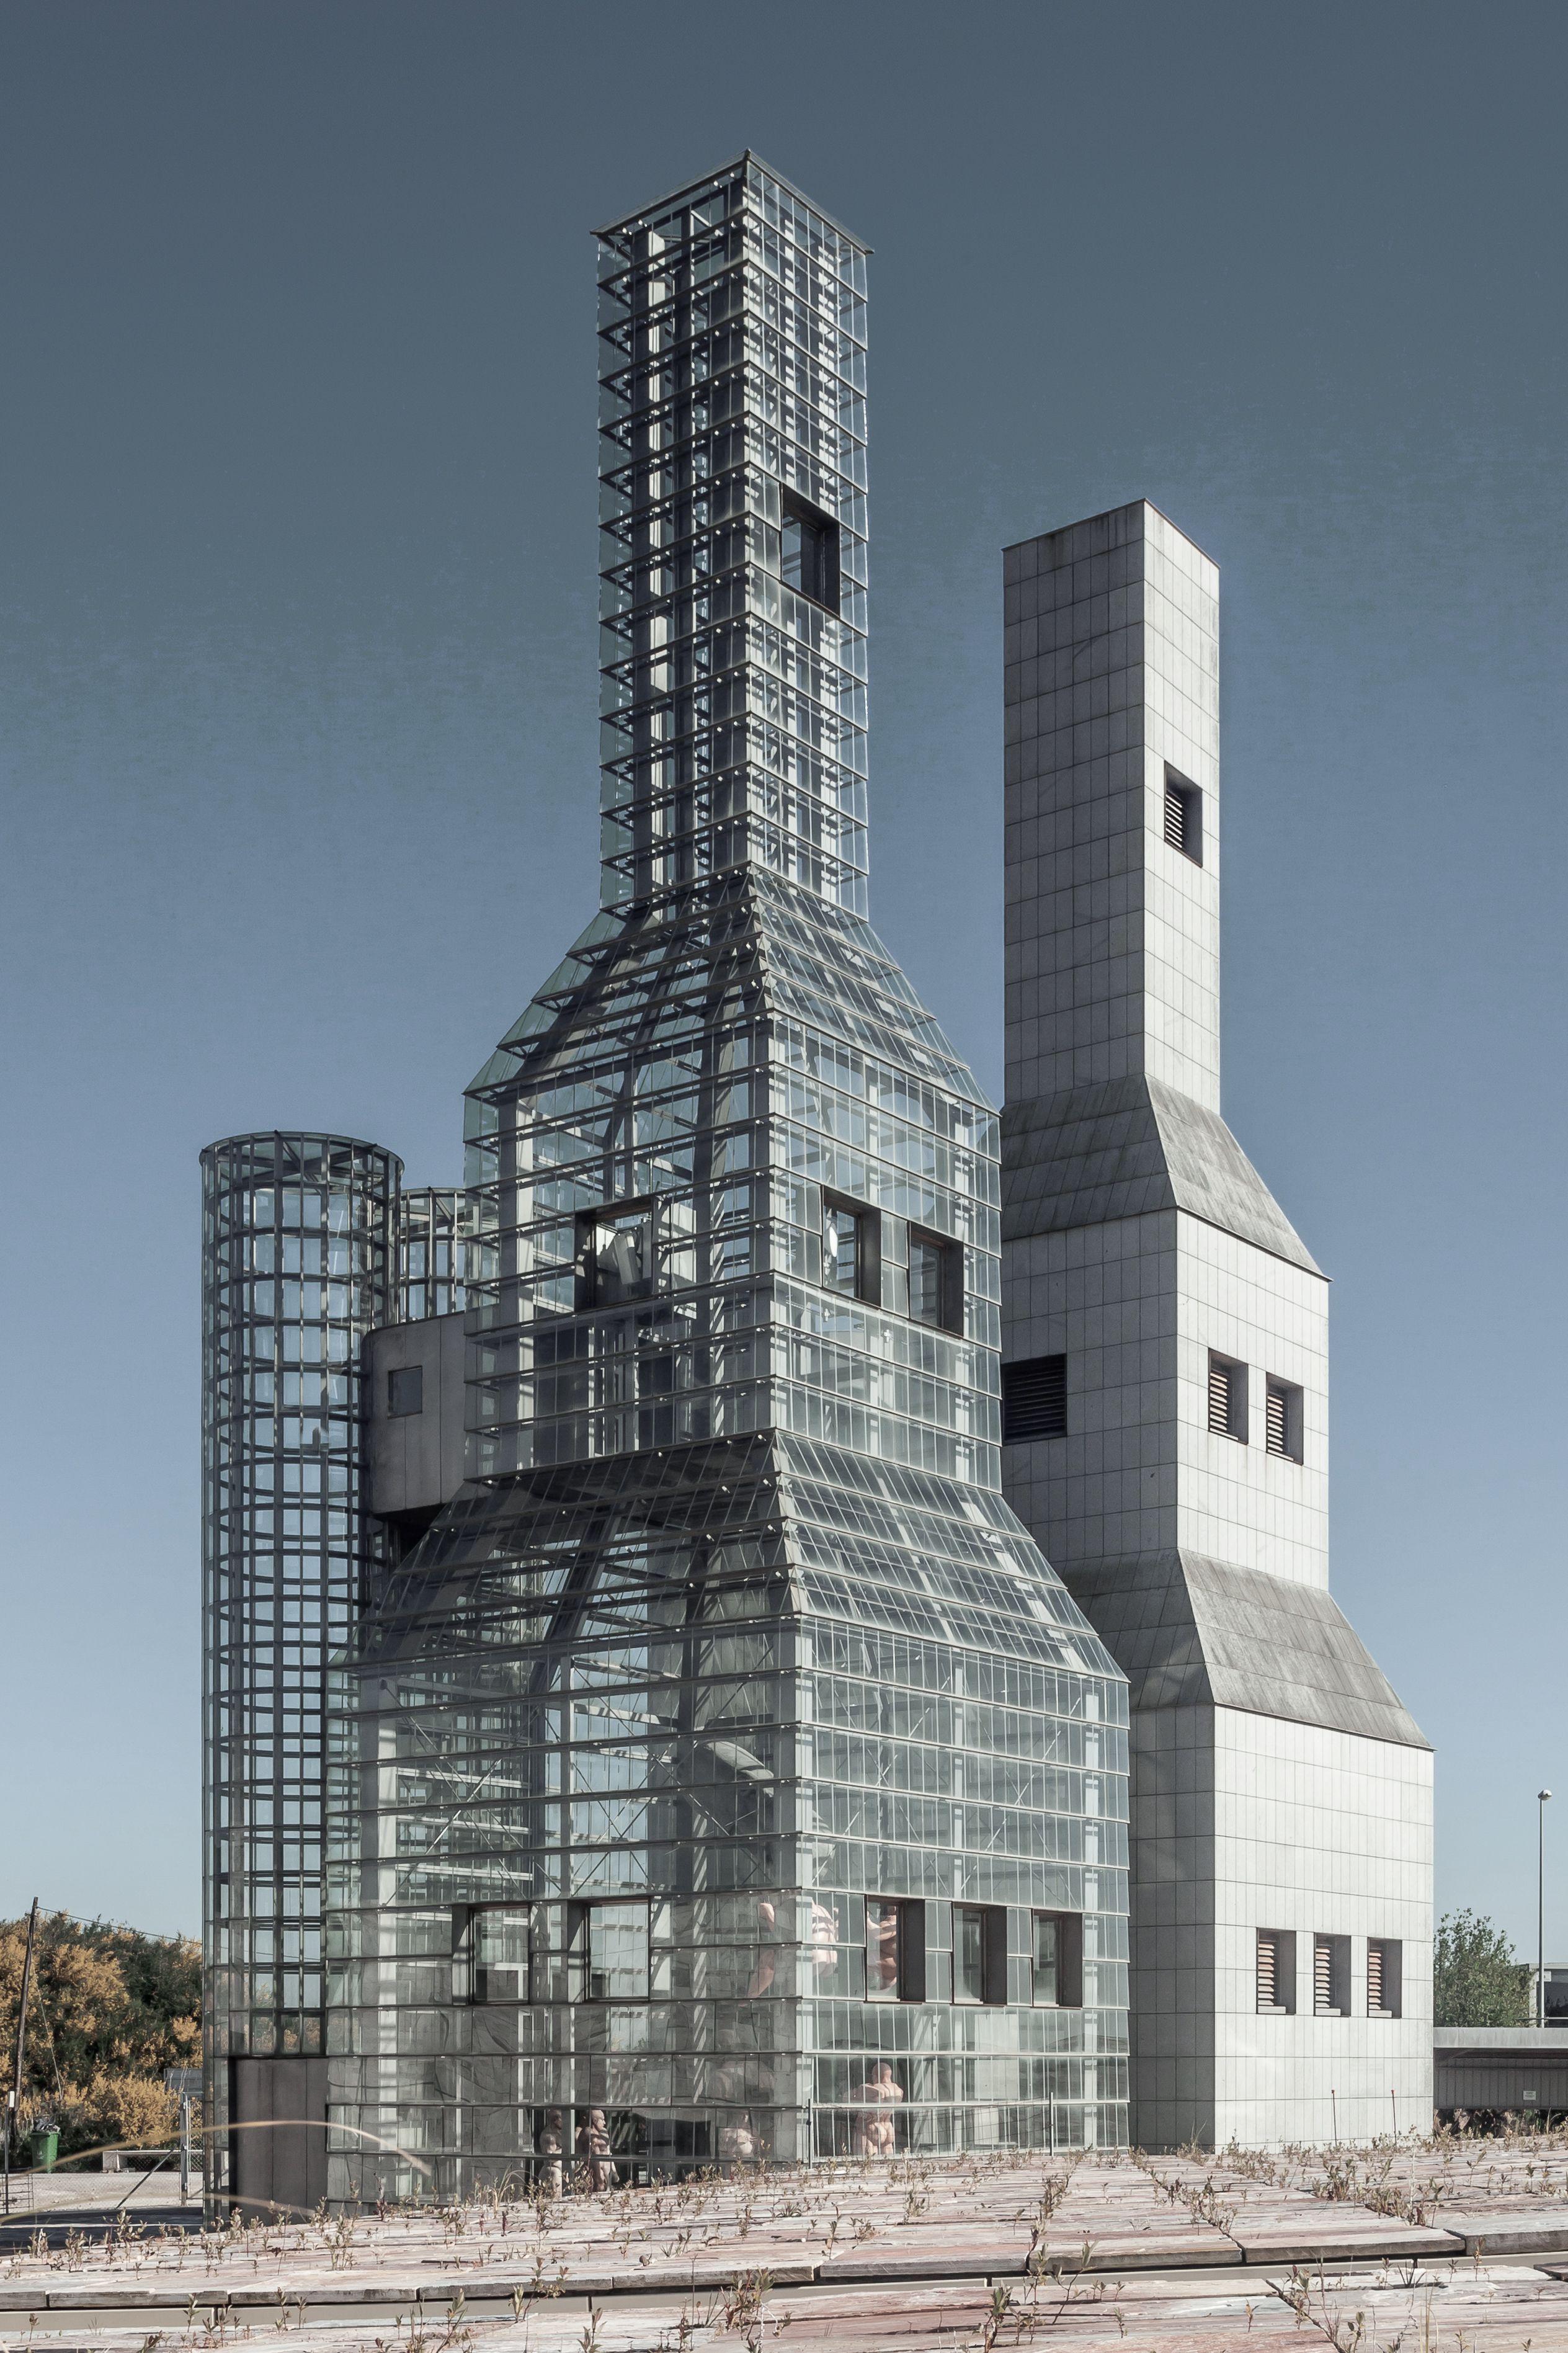 John Hejduk towers (Peter Eisenman)